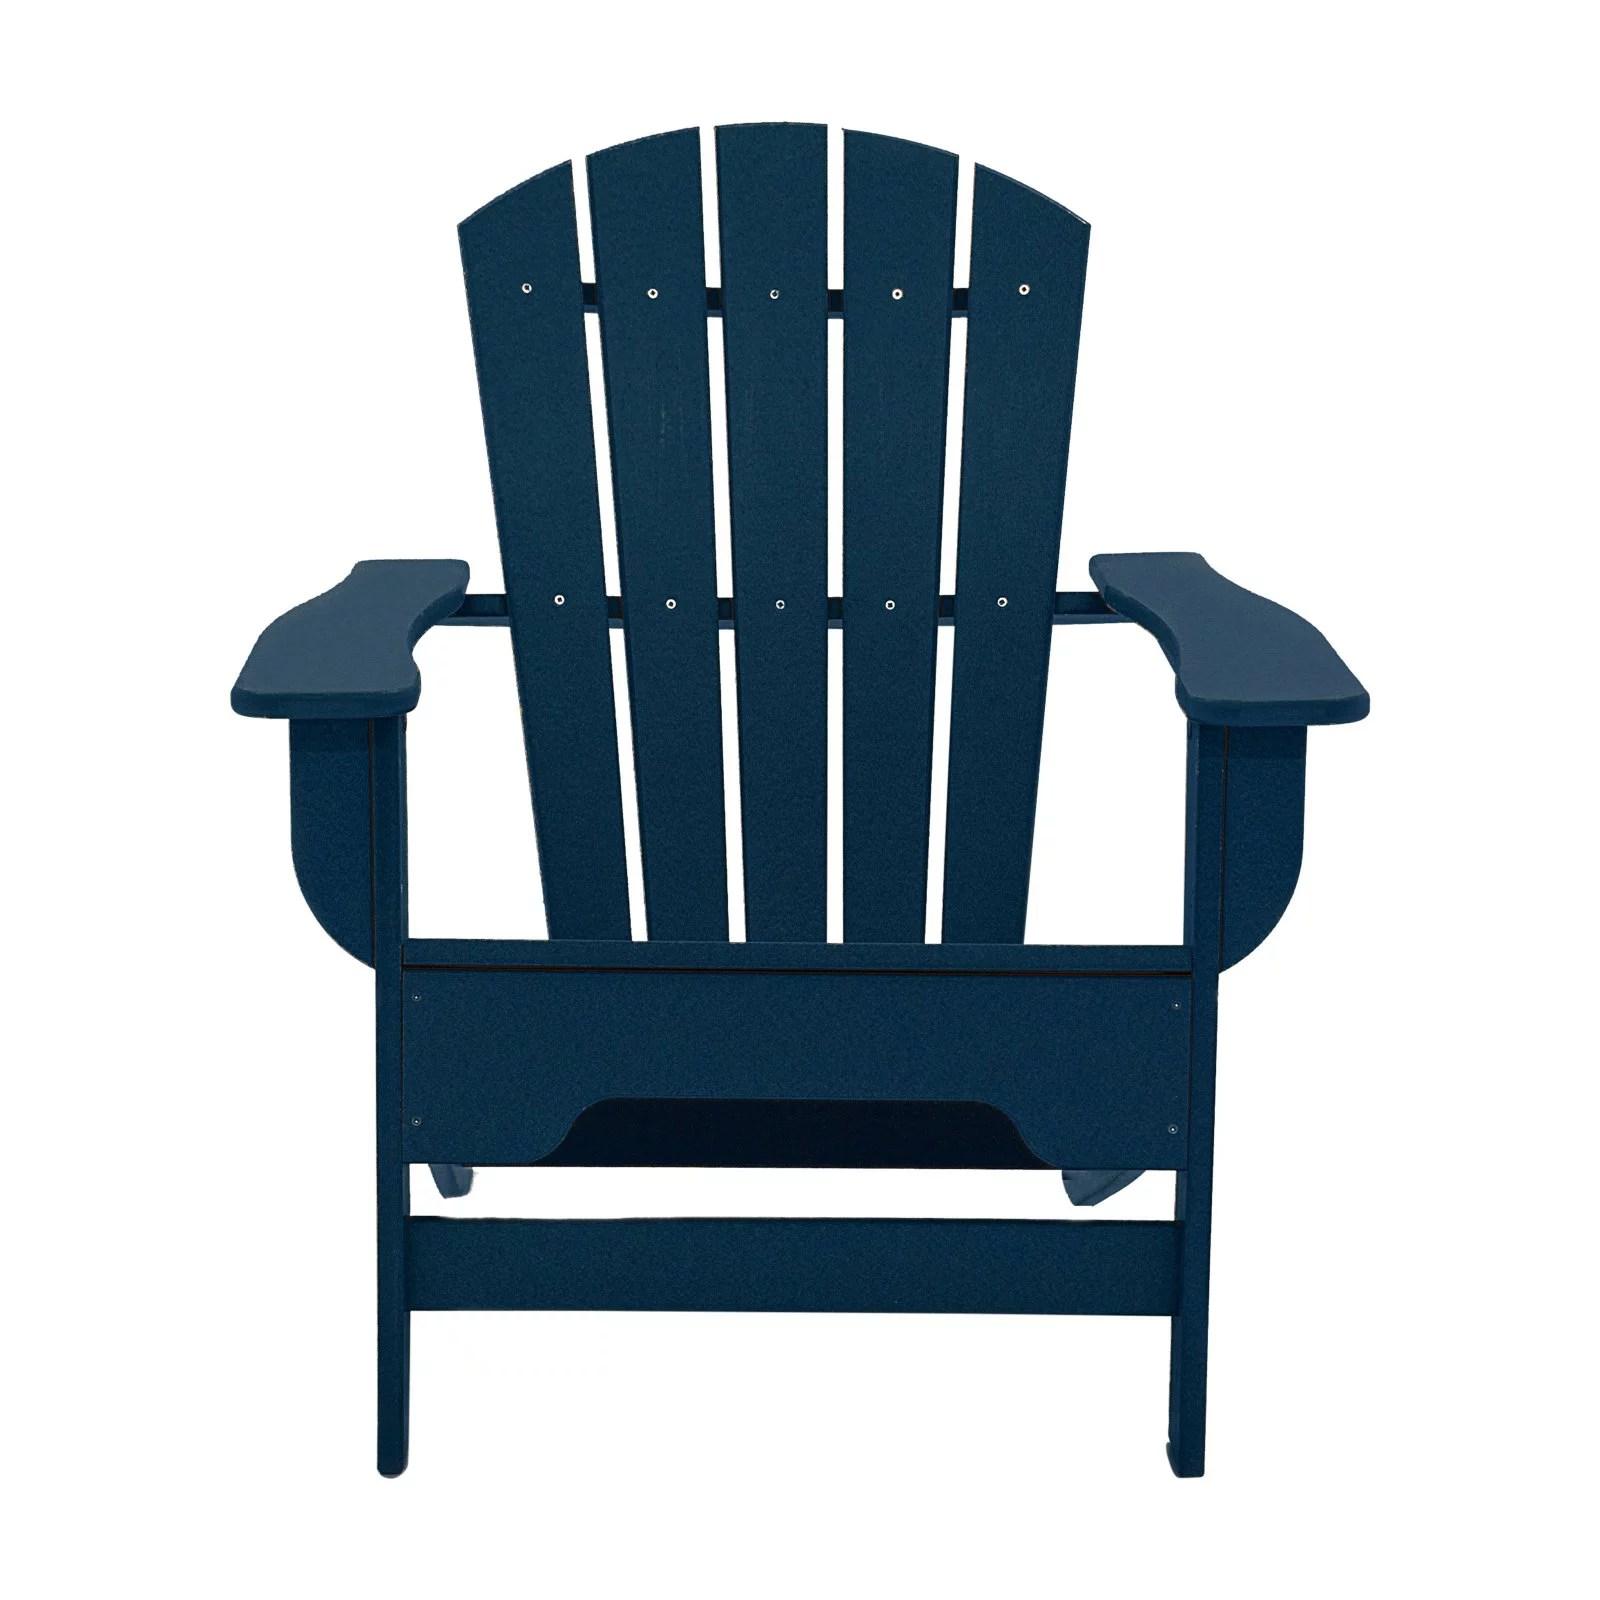 durogreen boca raton adirondack chair set of 4